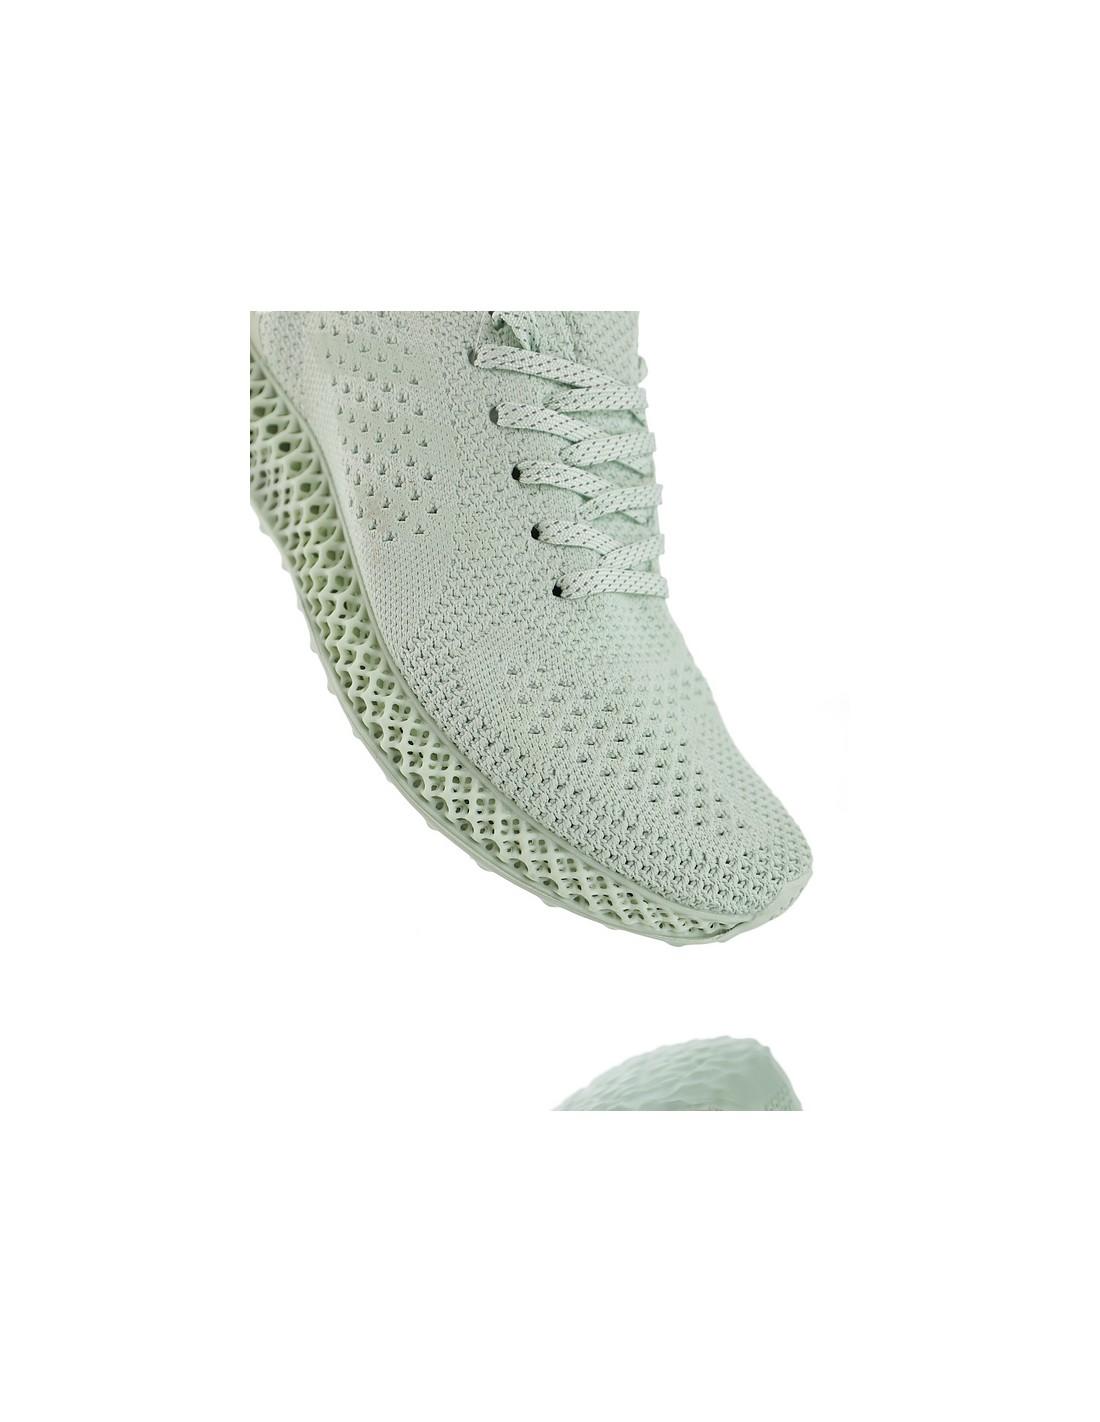 premium selection c0db2 5d4ff Adidas FutureCraft 4D x Daniel Arsham Men's Shoe